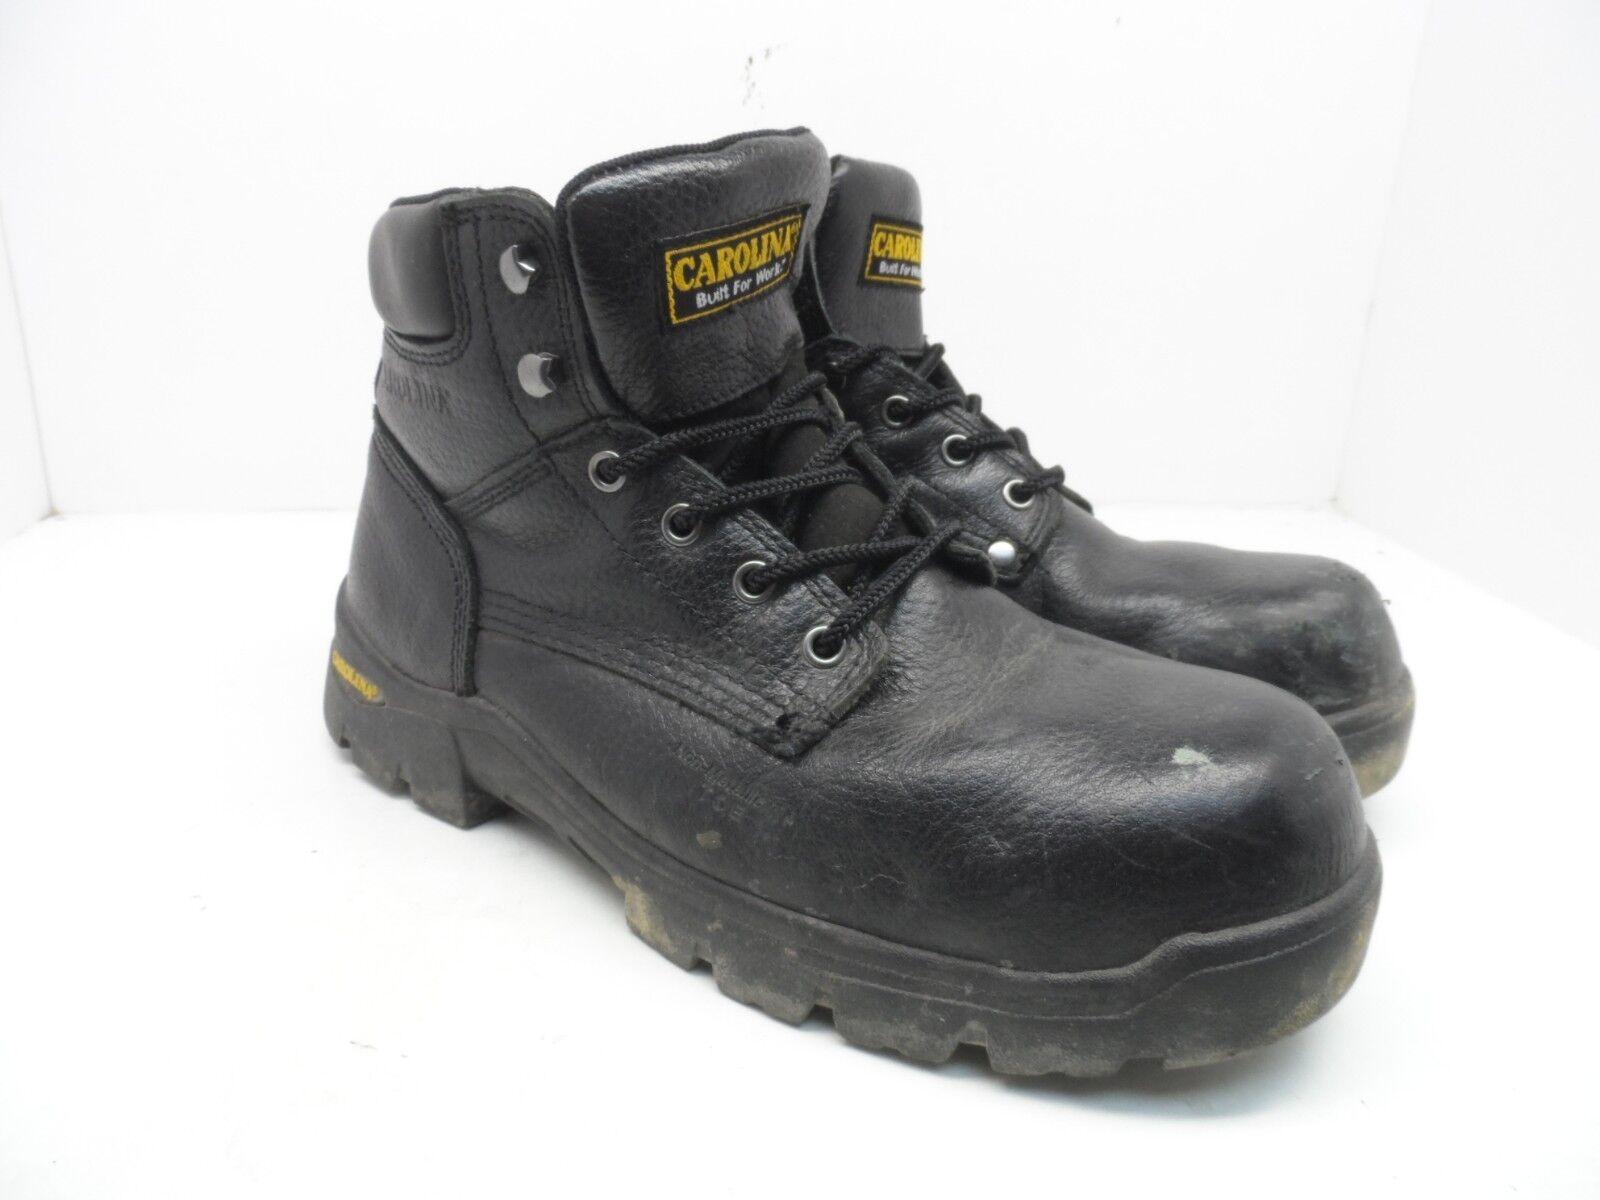 Carolina Men's 6  Comp Toe Work Boot CA9952 Black Size 9.5 Wide 2E